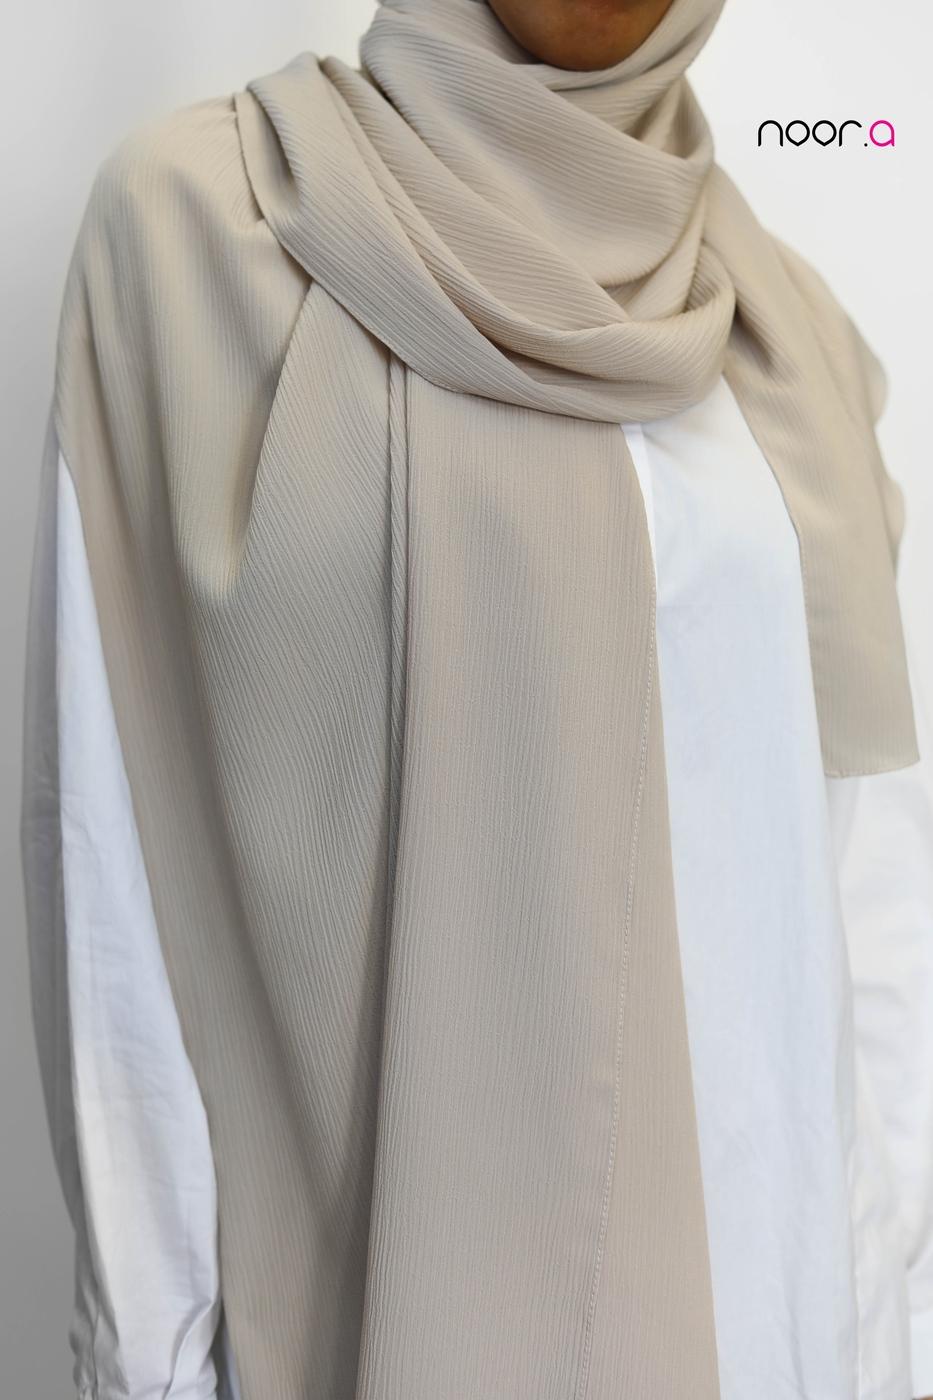 hijab-soie-de-medine-plissé-écru